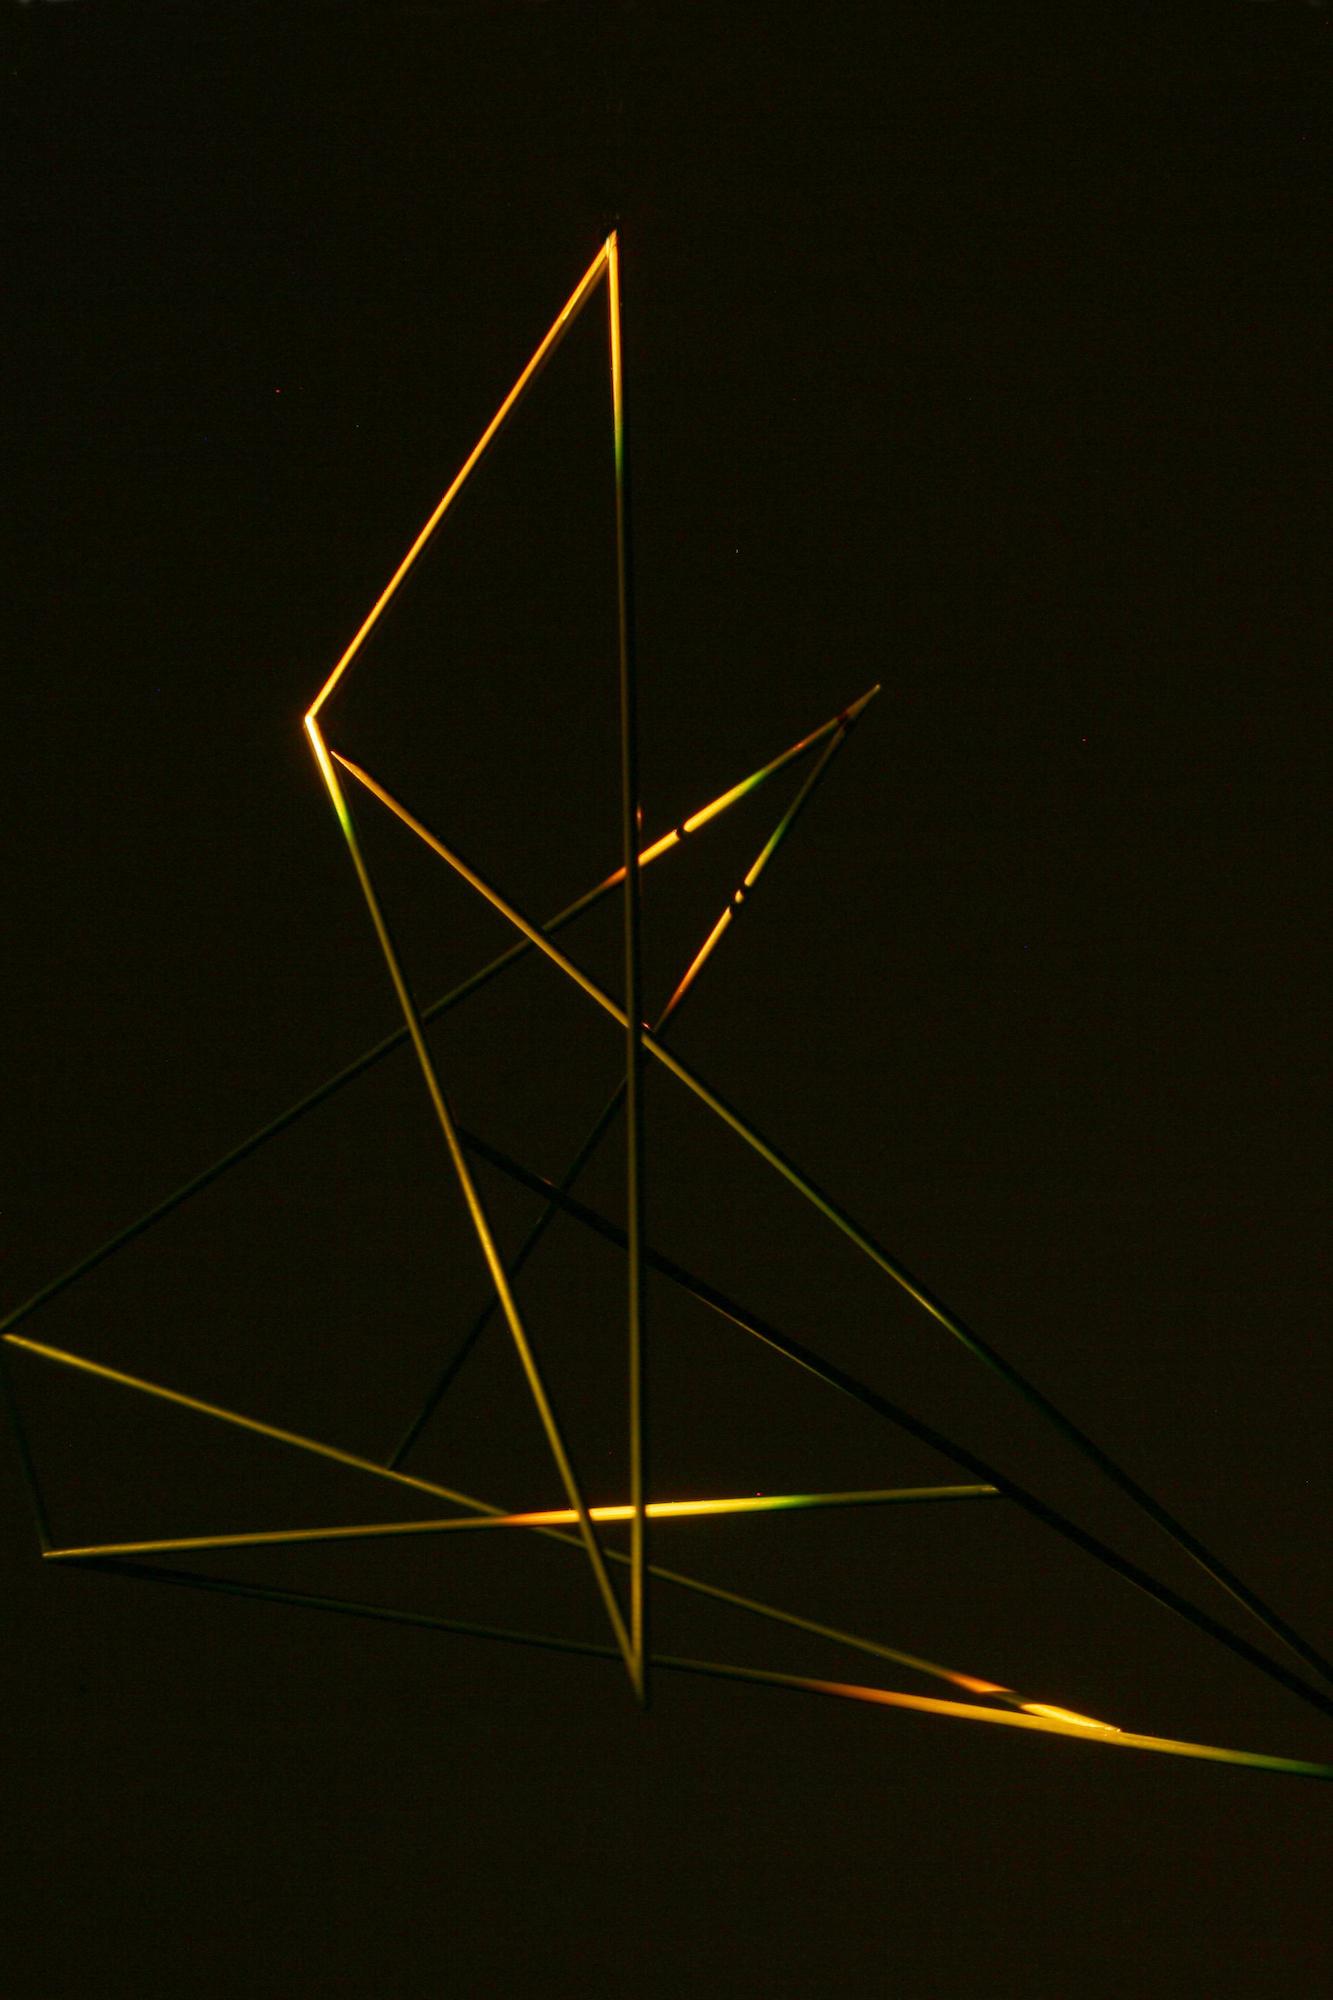 eleanor-bell-light-artist-balancing-contrast-order-line-of-light.jpg